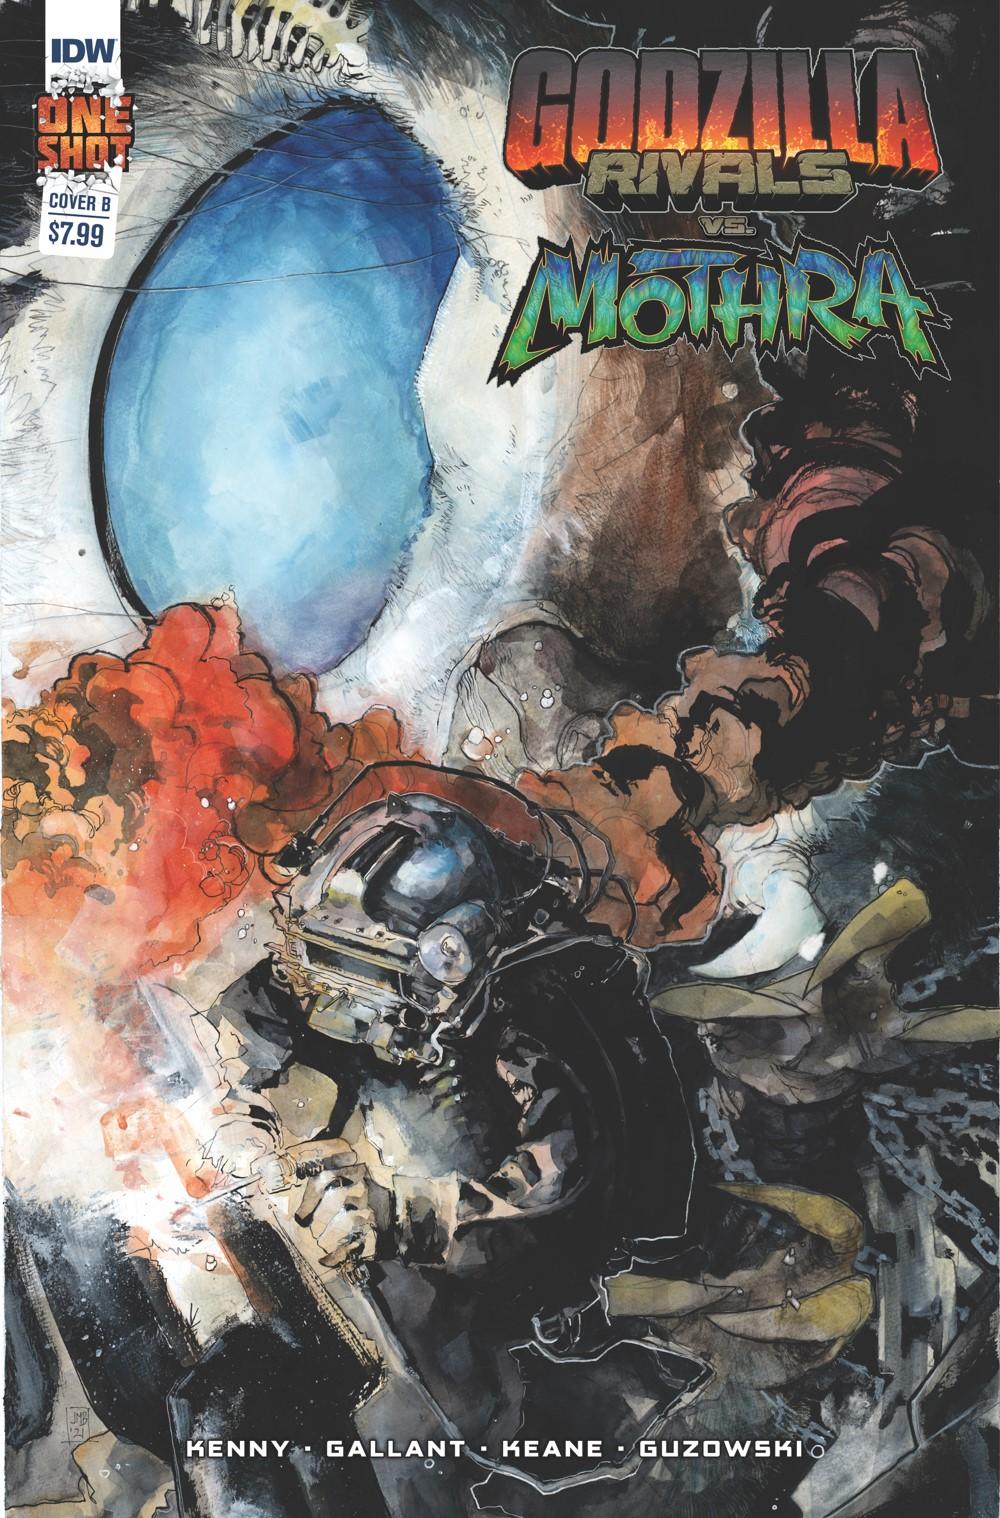 Godzilla_Rivals_2_Cover_RI ComicList Previews: GODZILLA RIVALS VS MOTHRA #1